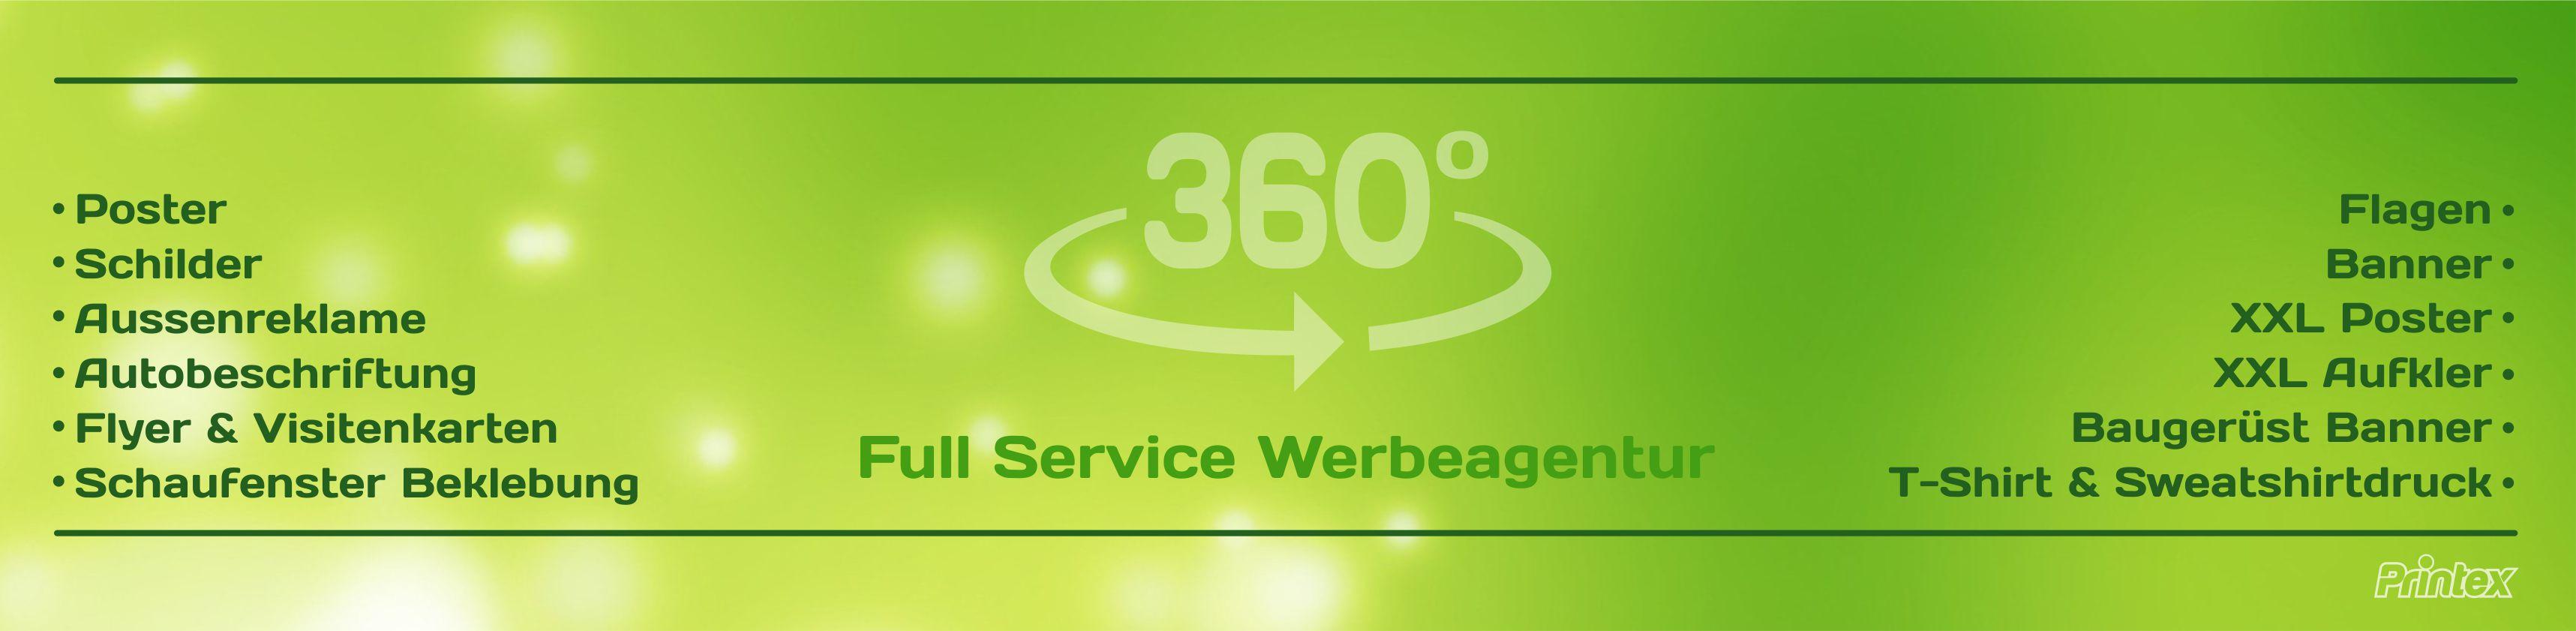 360grad_Werbeagentur